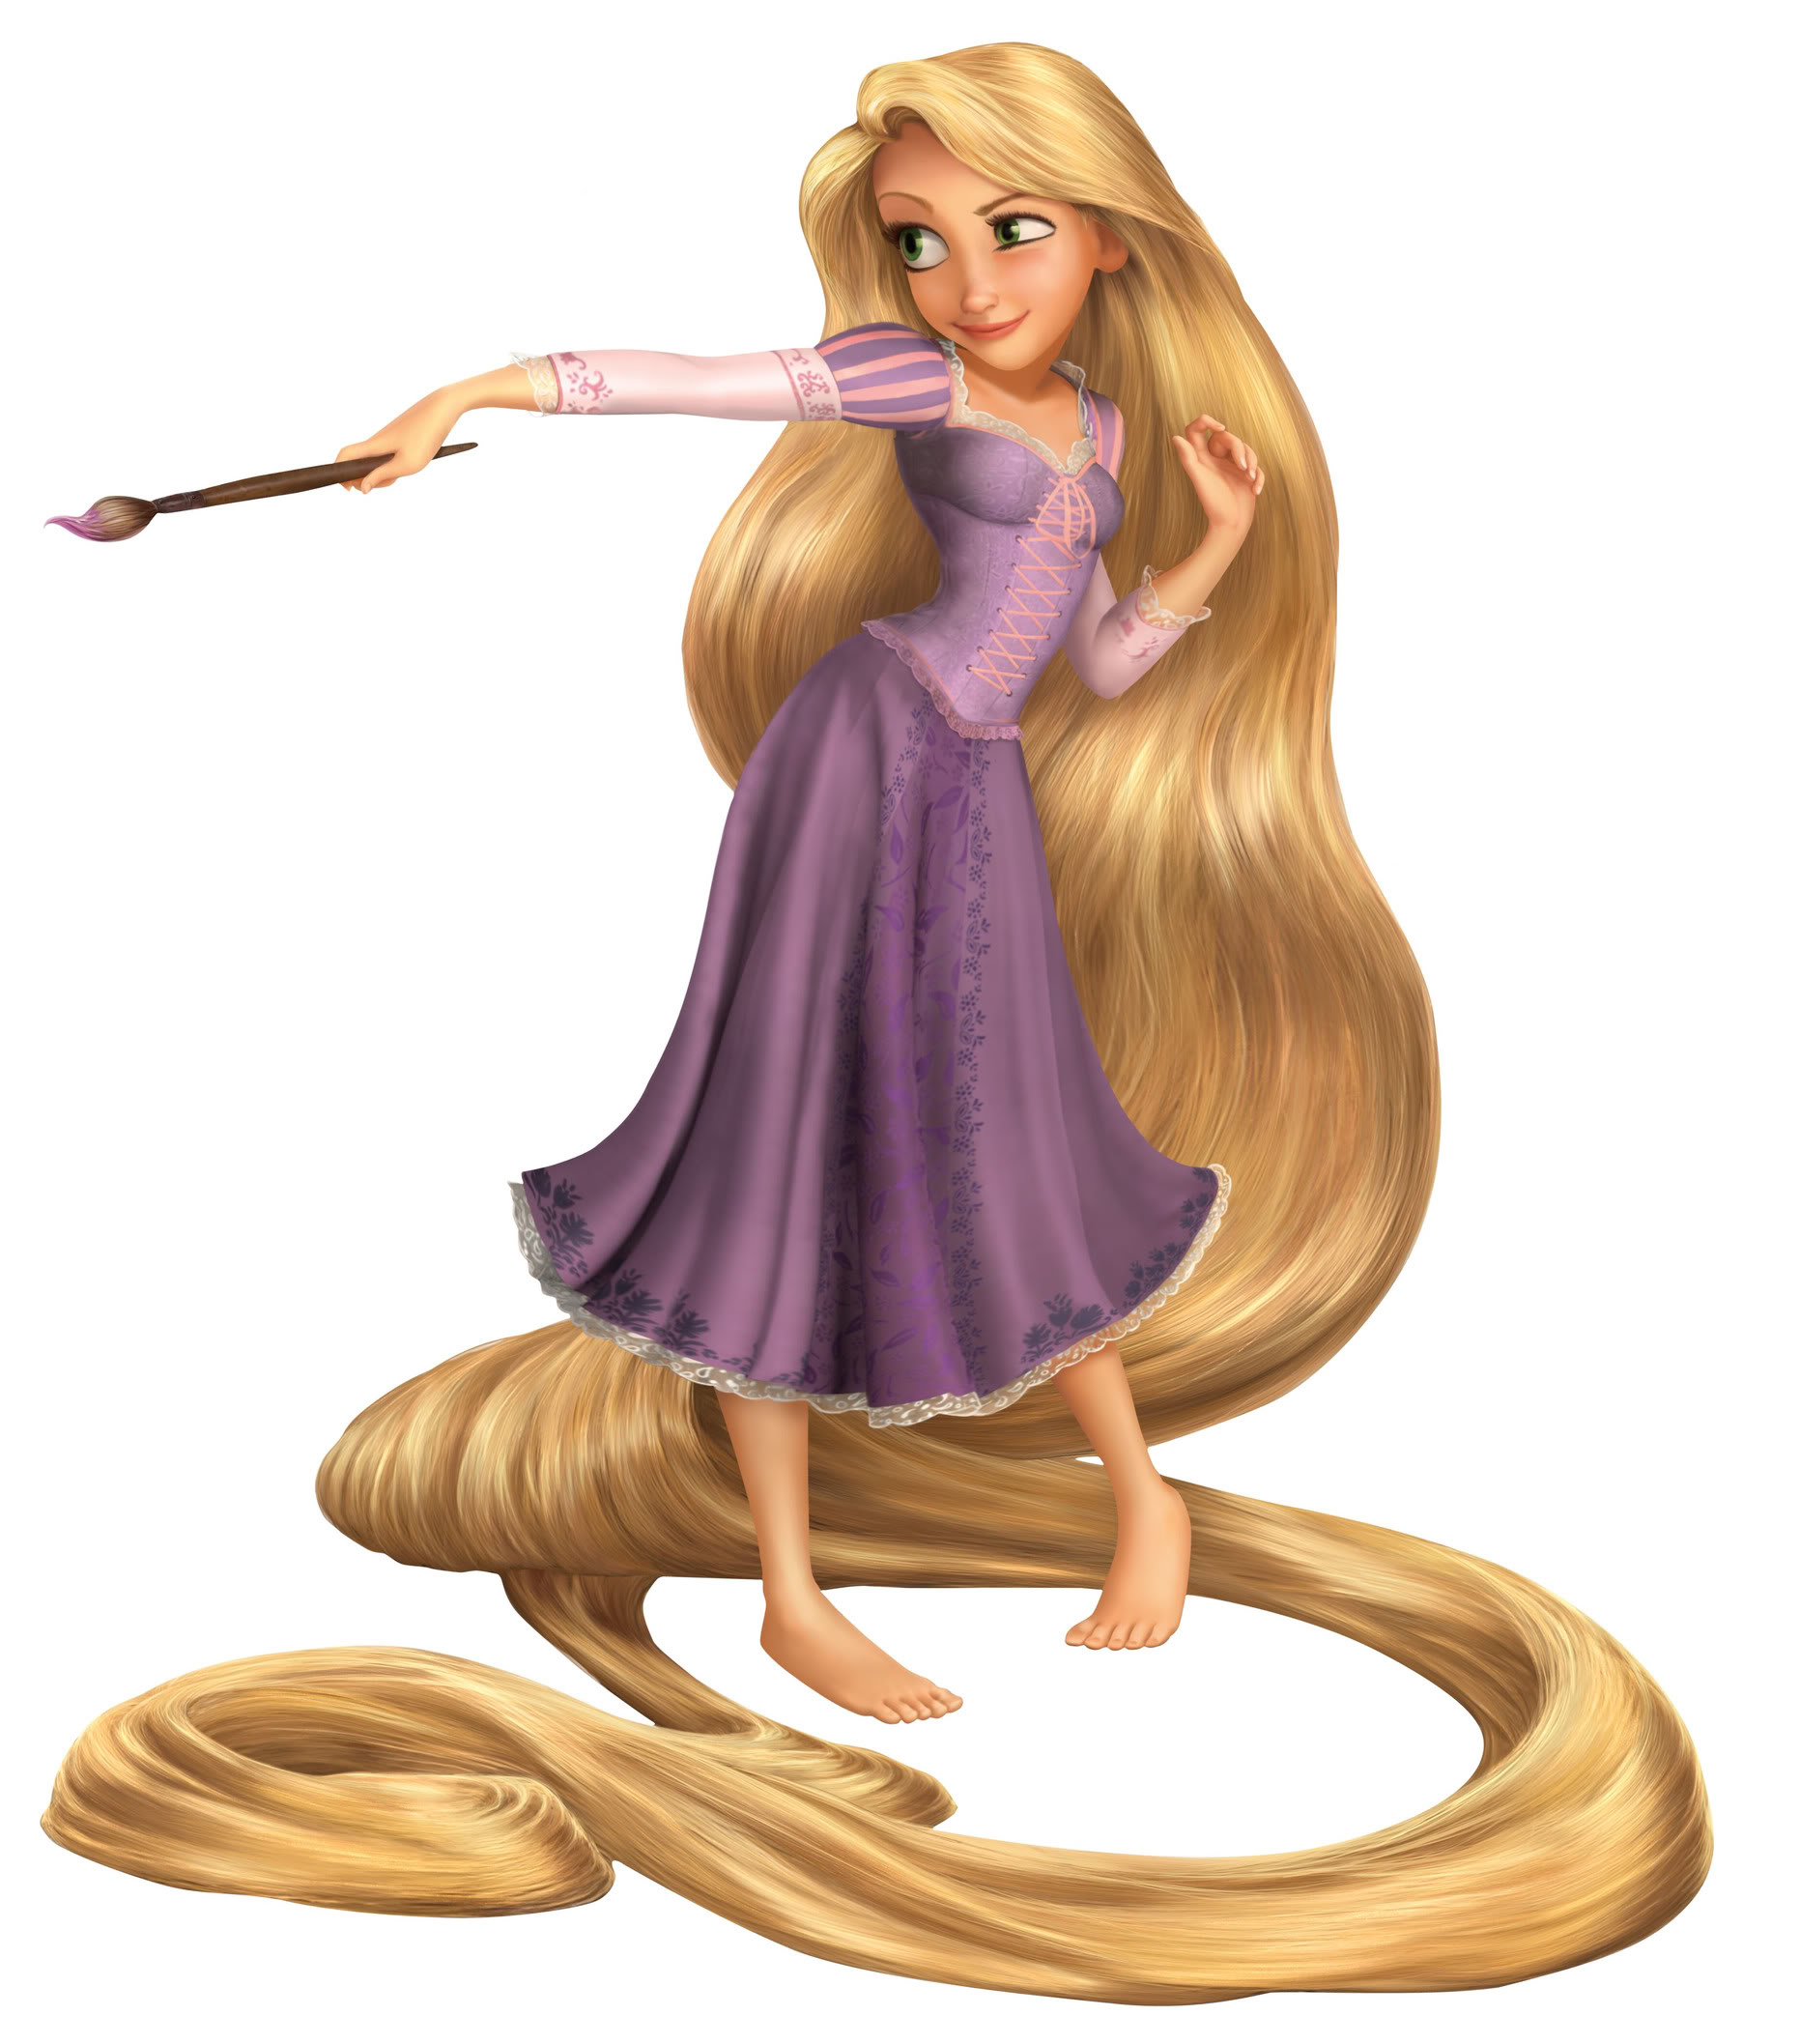 Rapunzel | The Disney Princess Roleplay Wiki | FANDOM powered by Wikia for Rapunzel Tangled Full Body  70ref